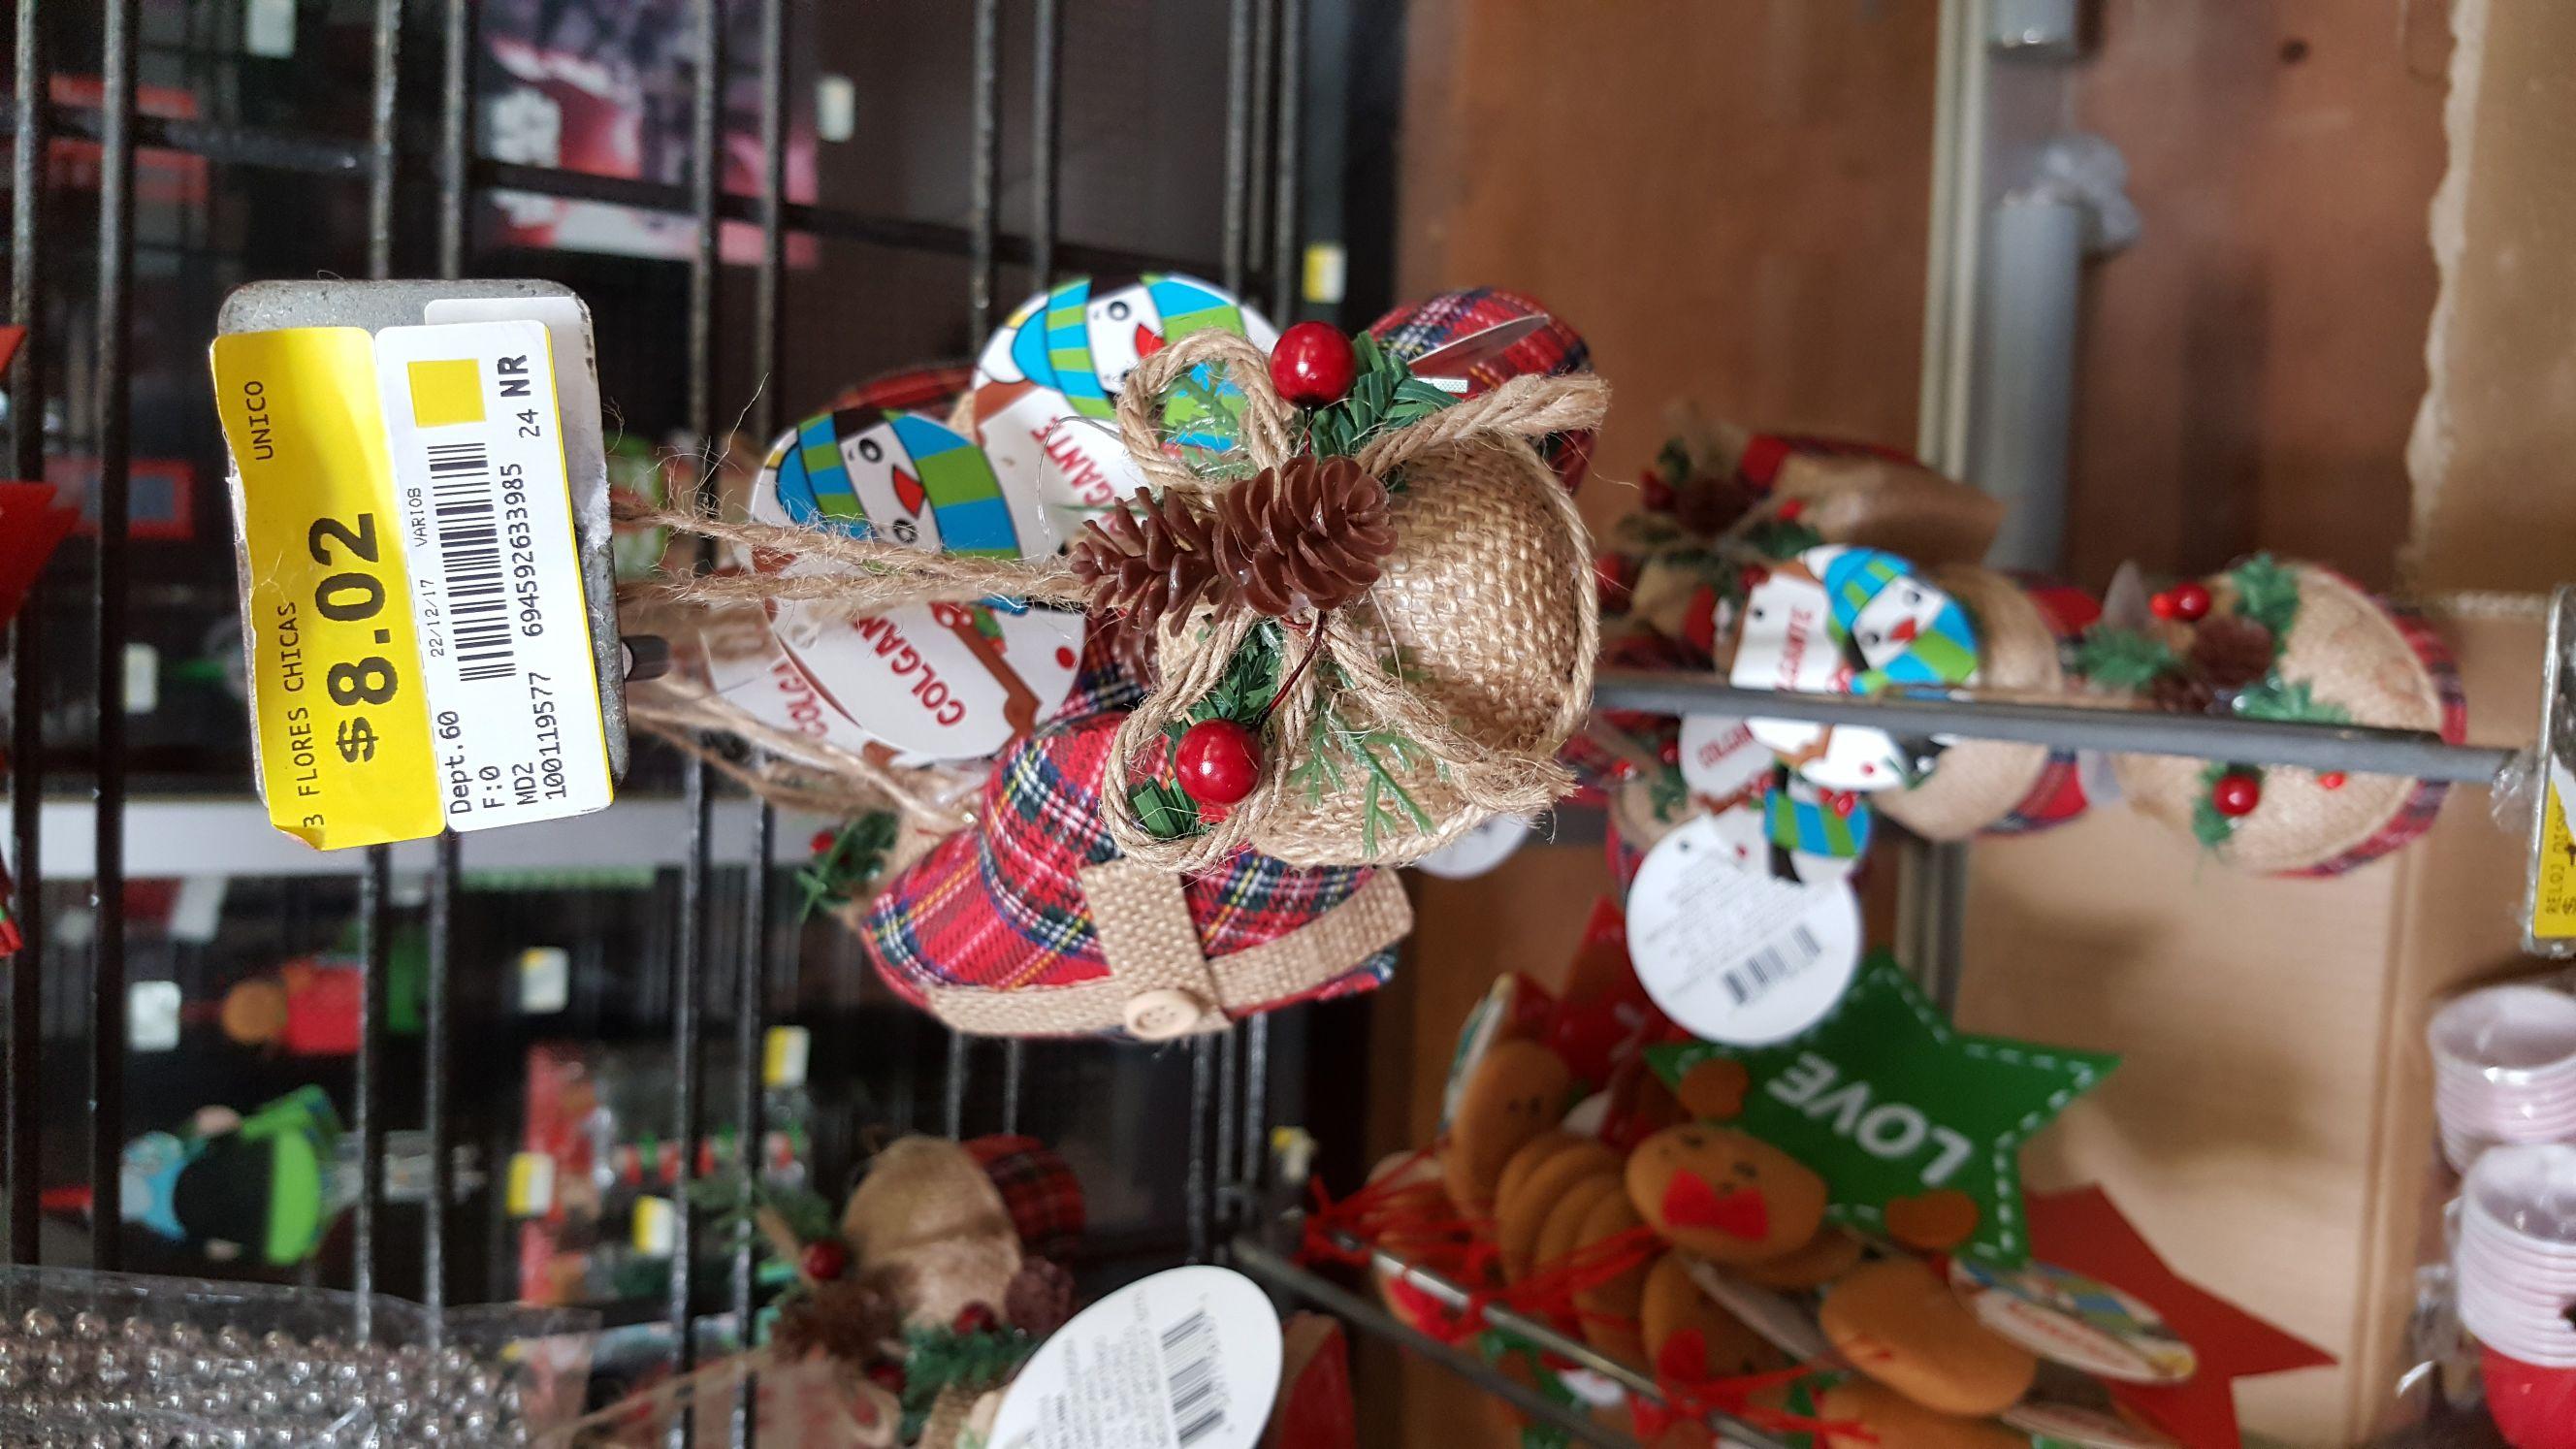 Prichos Macro Plaza Pto Vallarta: Pequeños adornos navideños